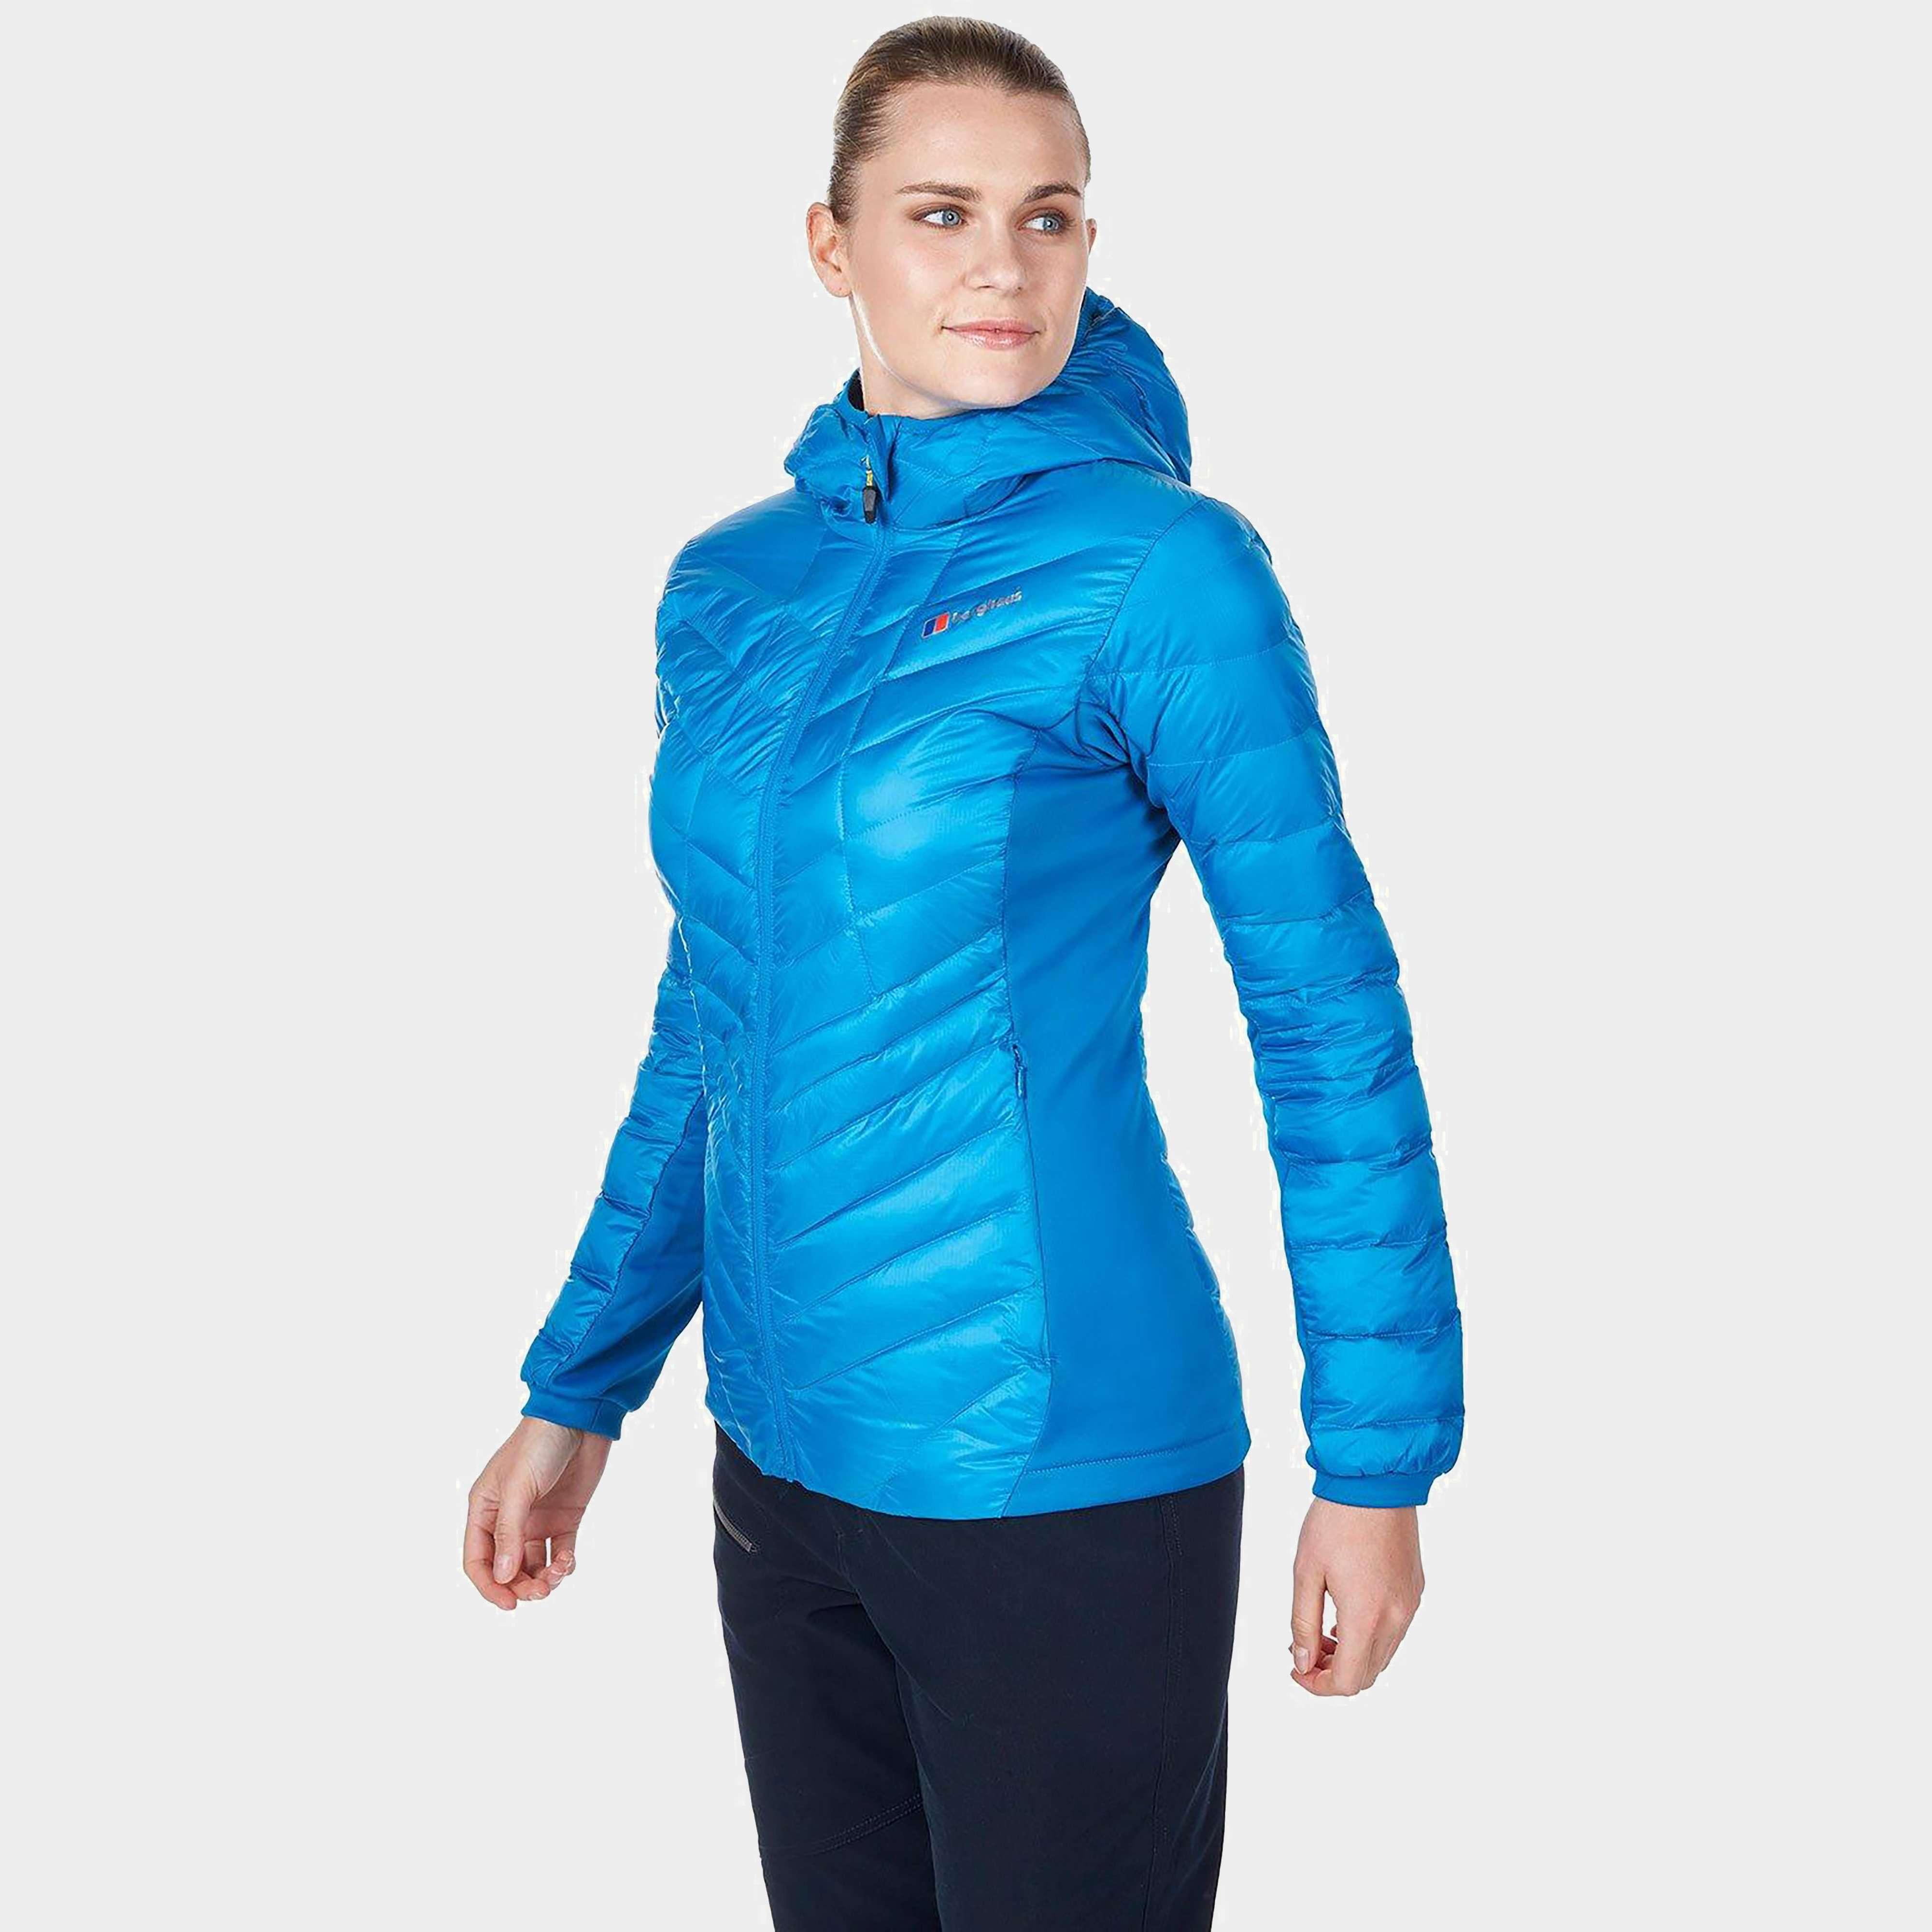 BERGHAUS Women's Scafell 2 Stretch HydroDown™ Jacket